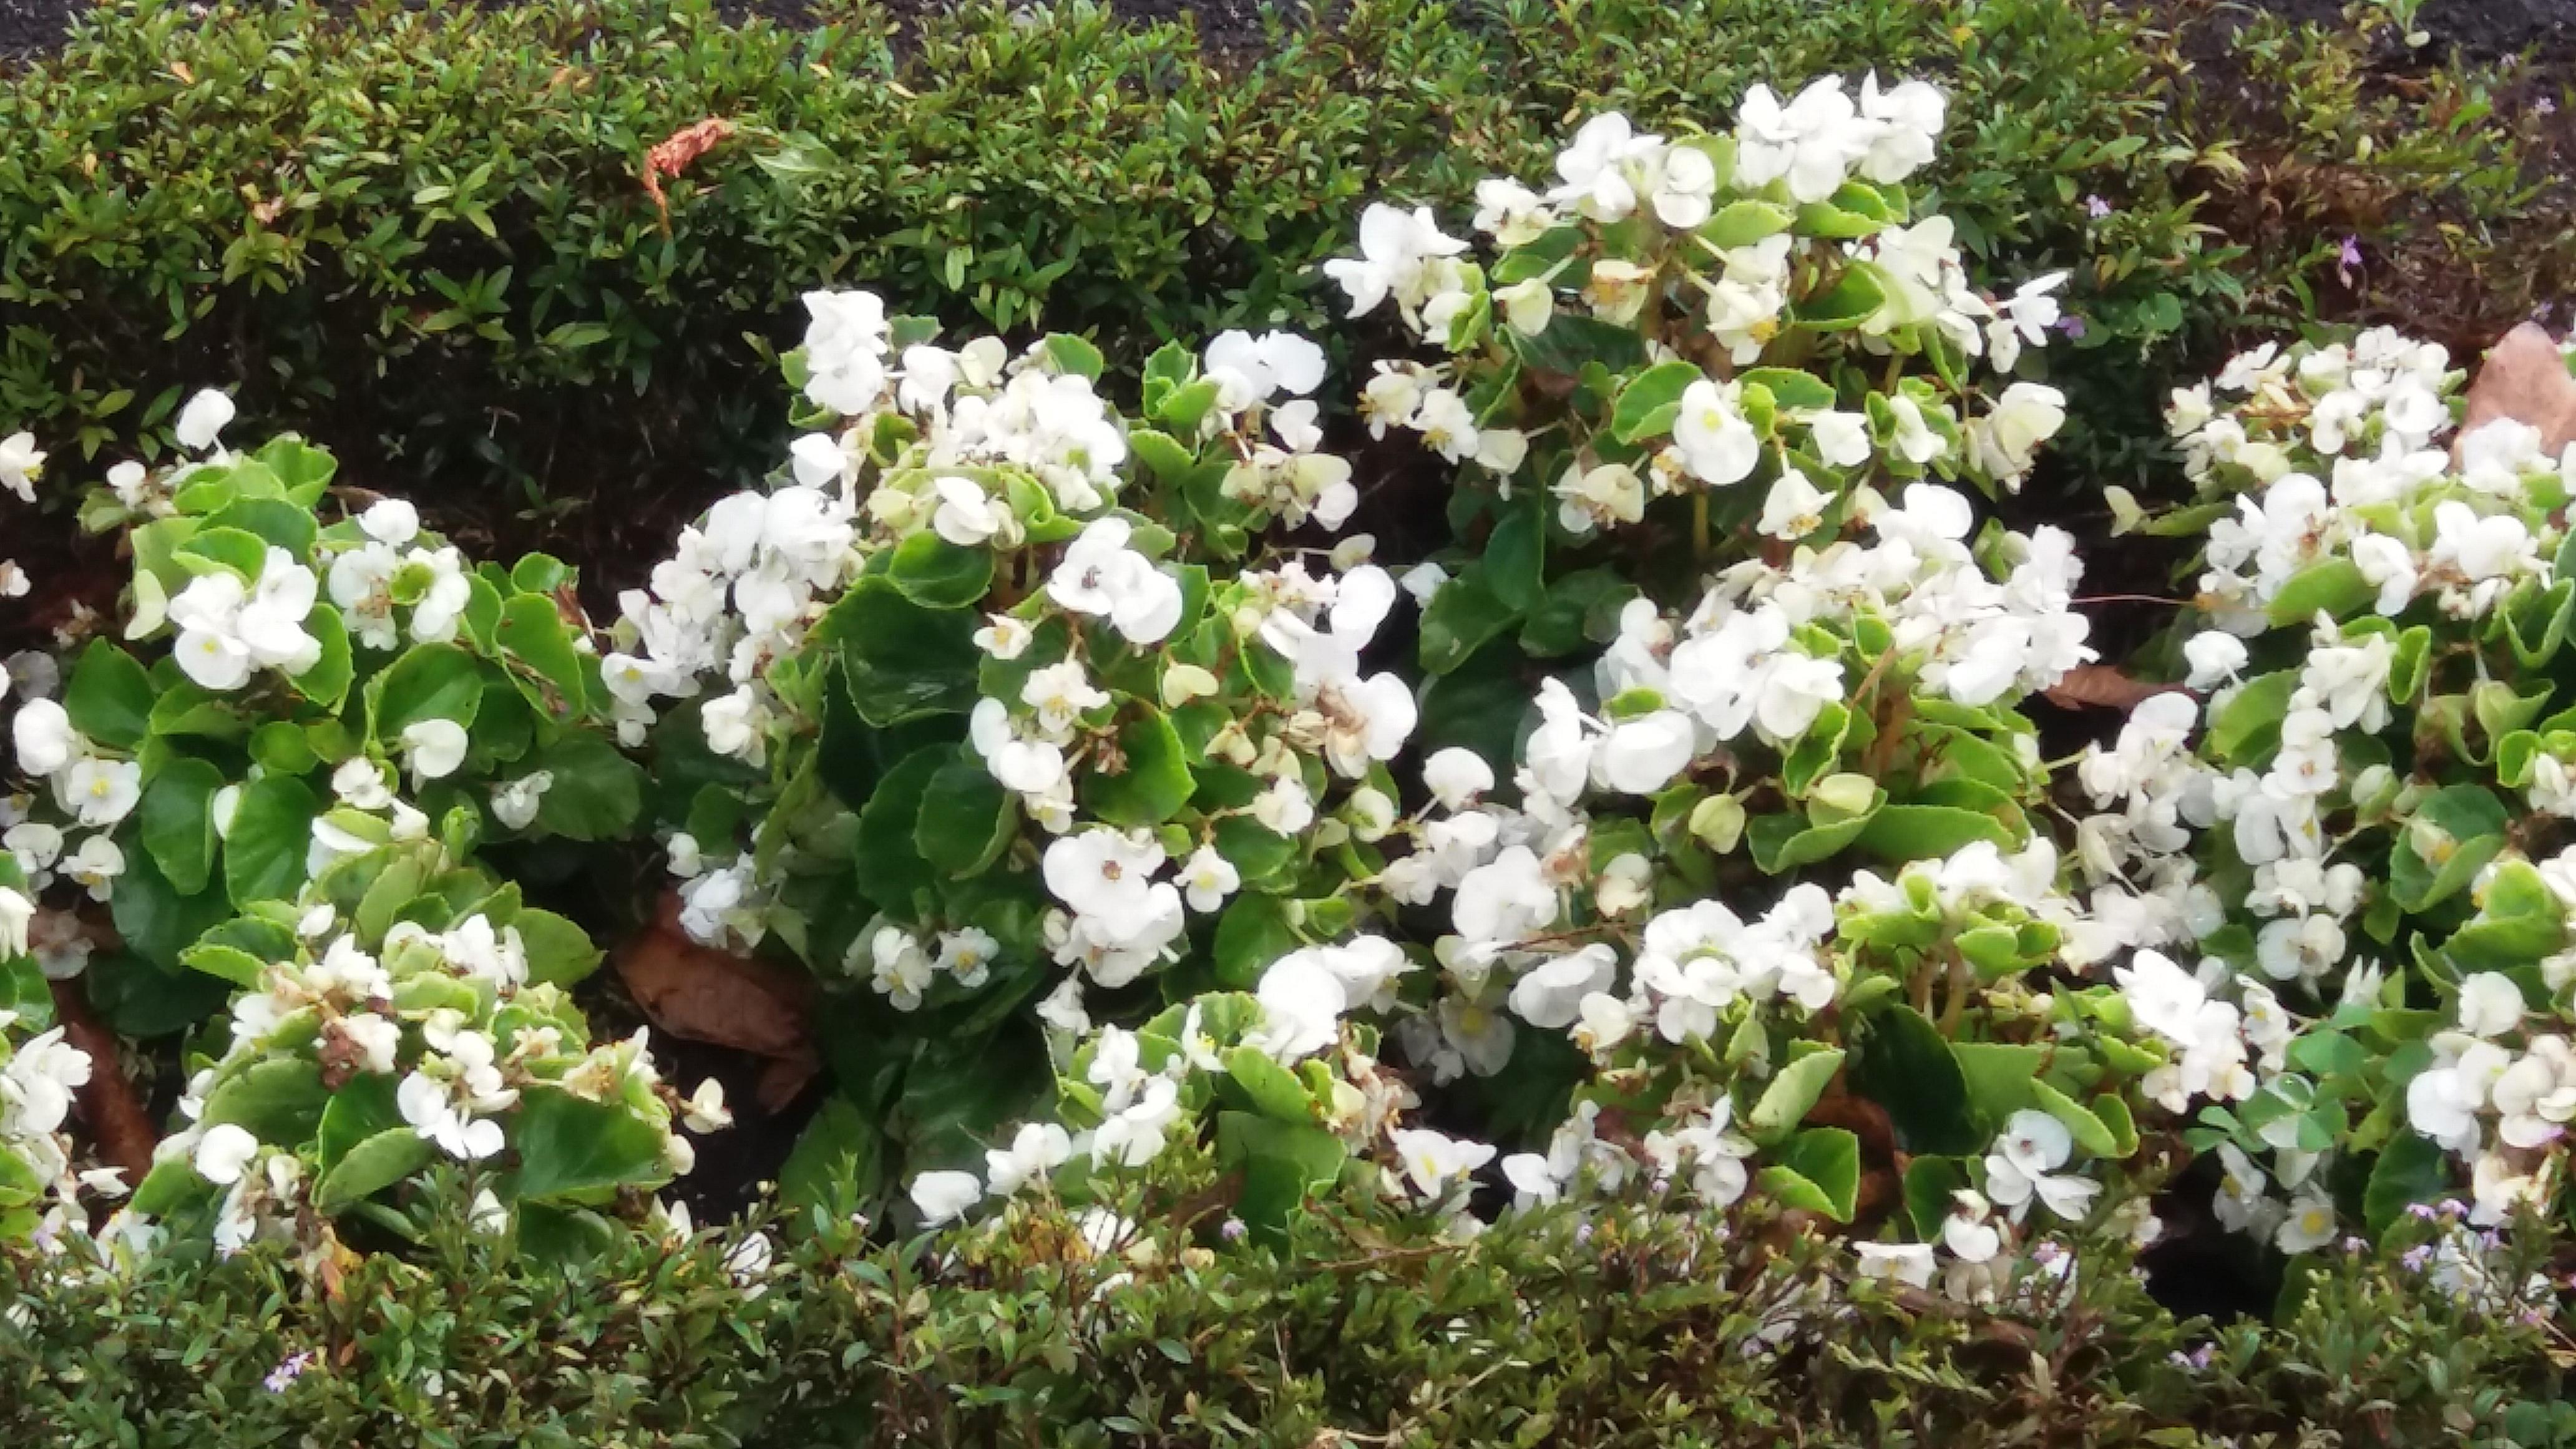 Fiori Gialli Yahoo.Immagini Belle Fiori Natura Fiore Pianta Fiorita Primavera